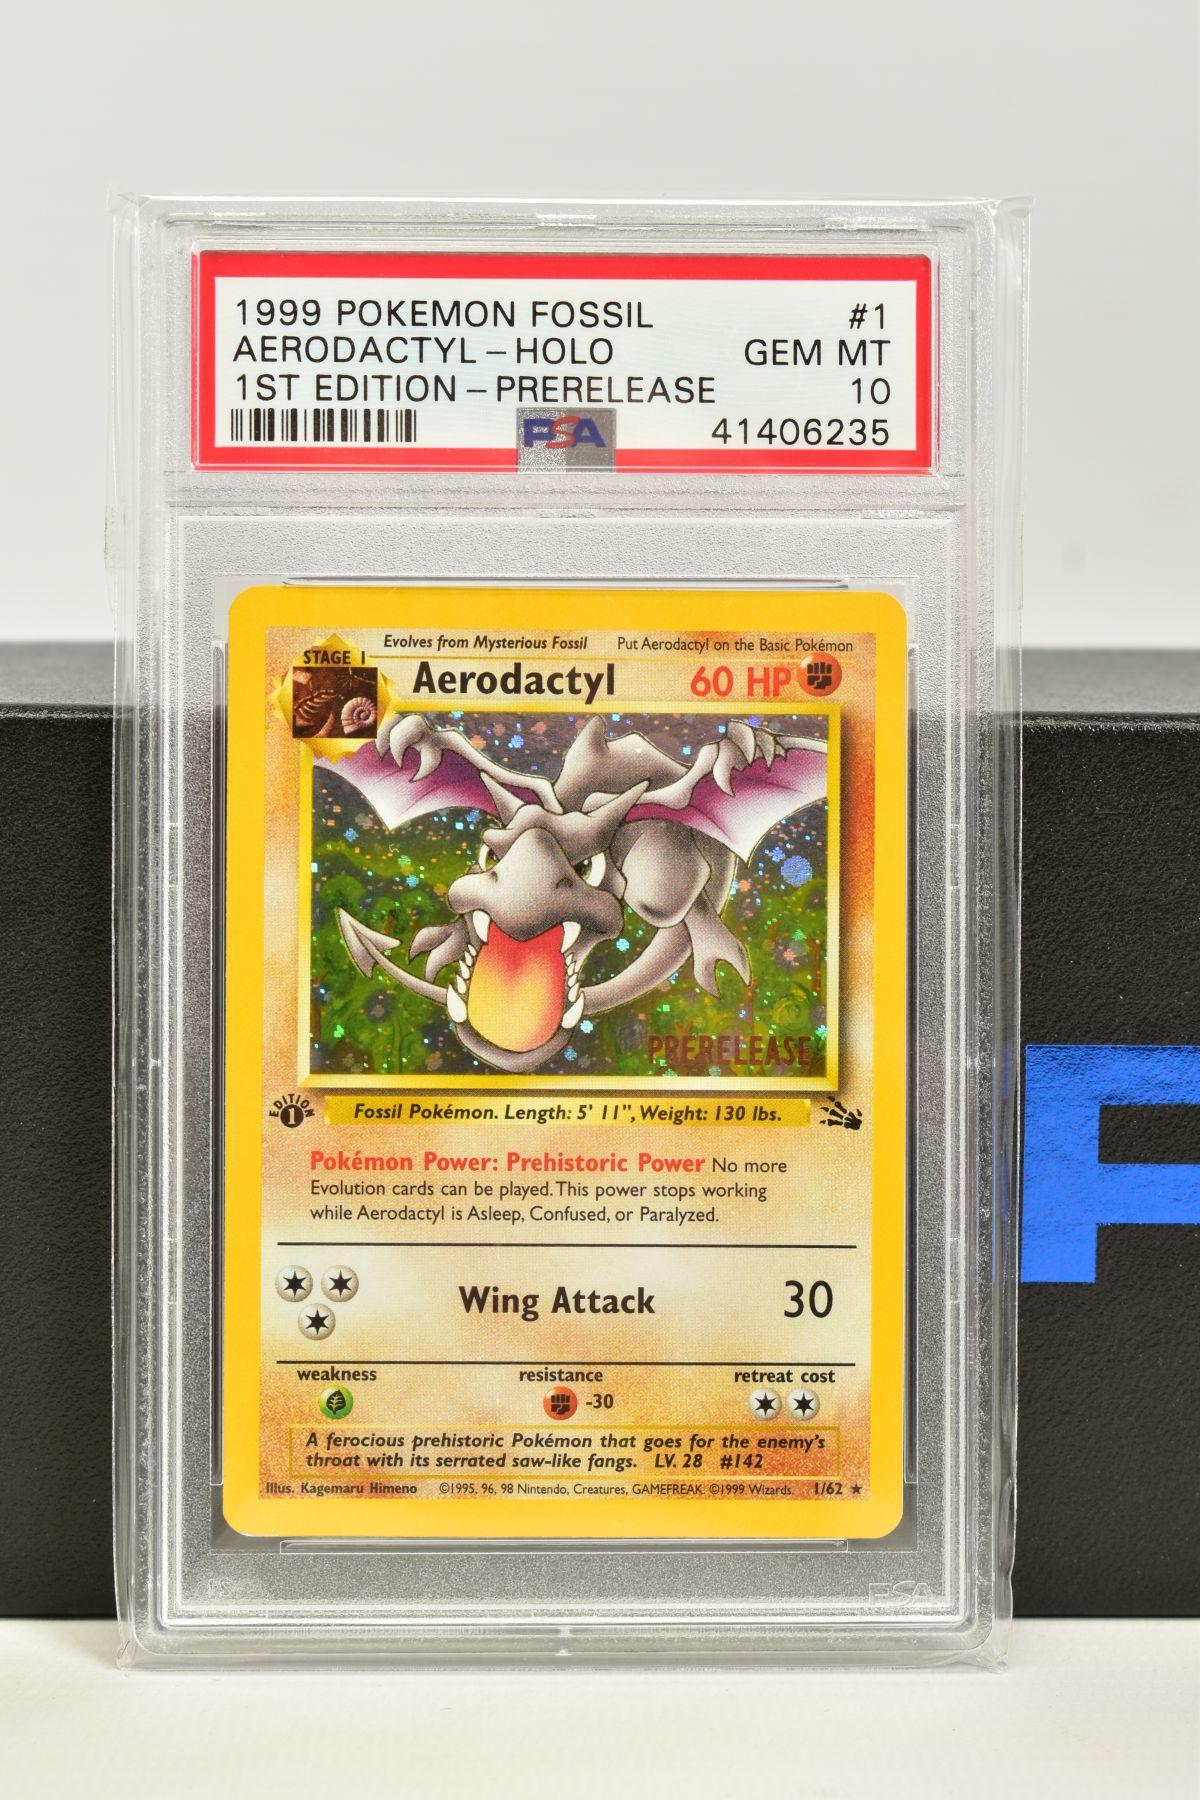 A PSA GRADED POKEMON 1ST EDITION PRE RELEASE FOSSIL SET AERODACTYL HOLO CARD, (1/62), Cosmo foil,